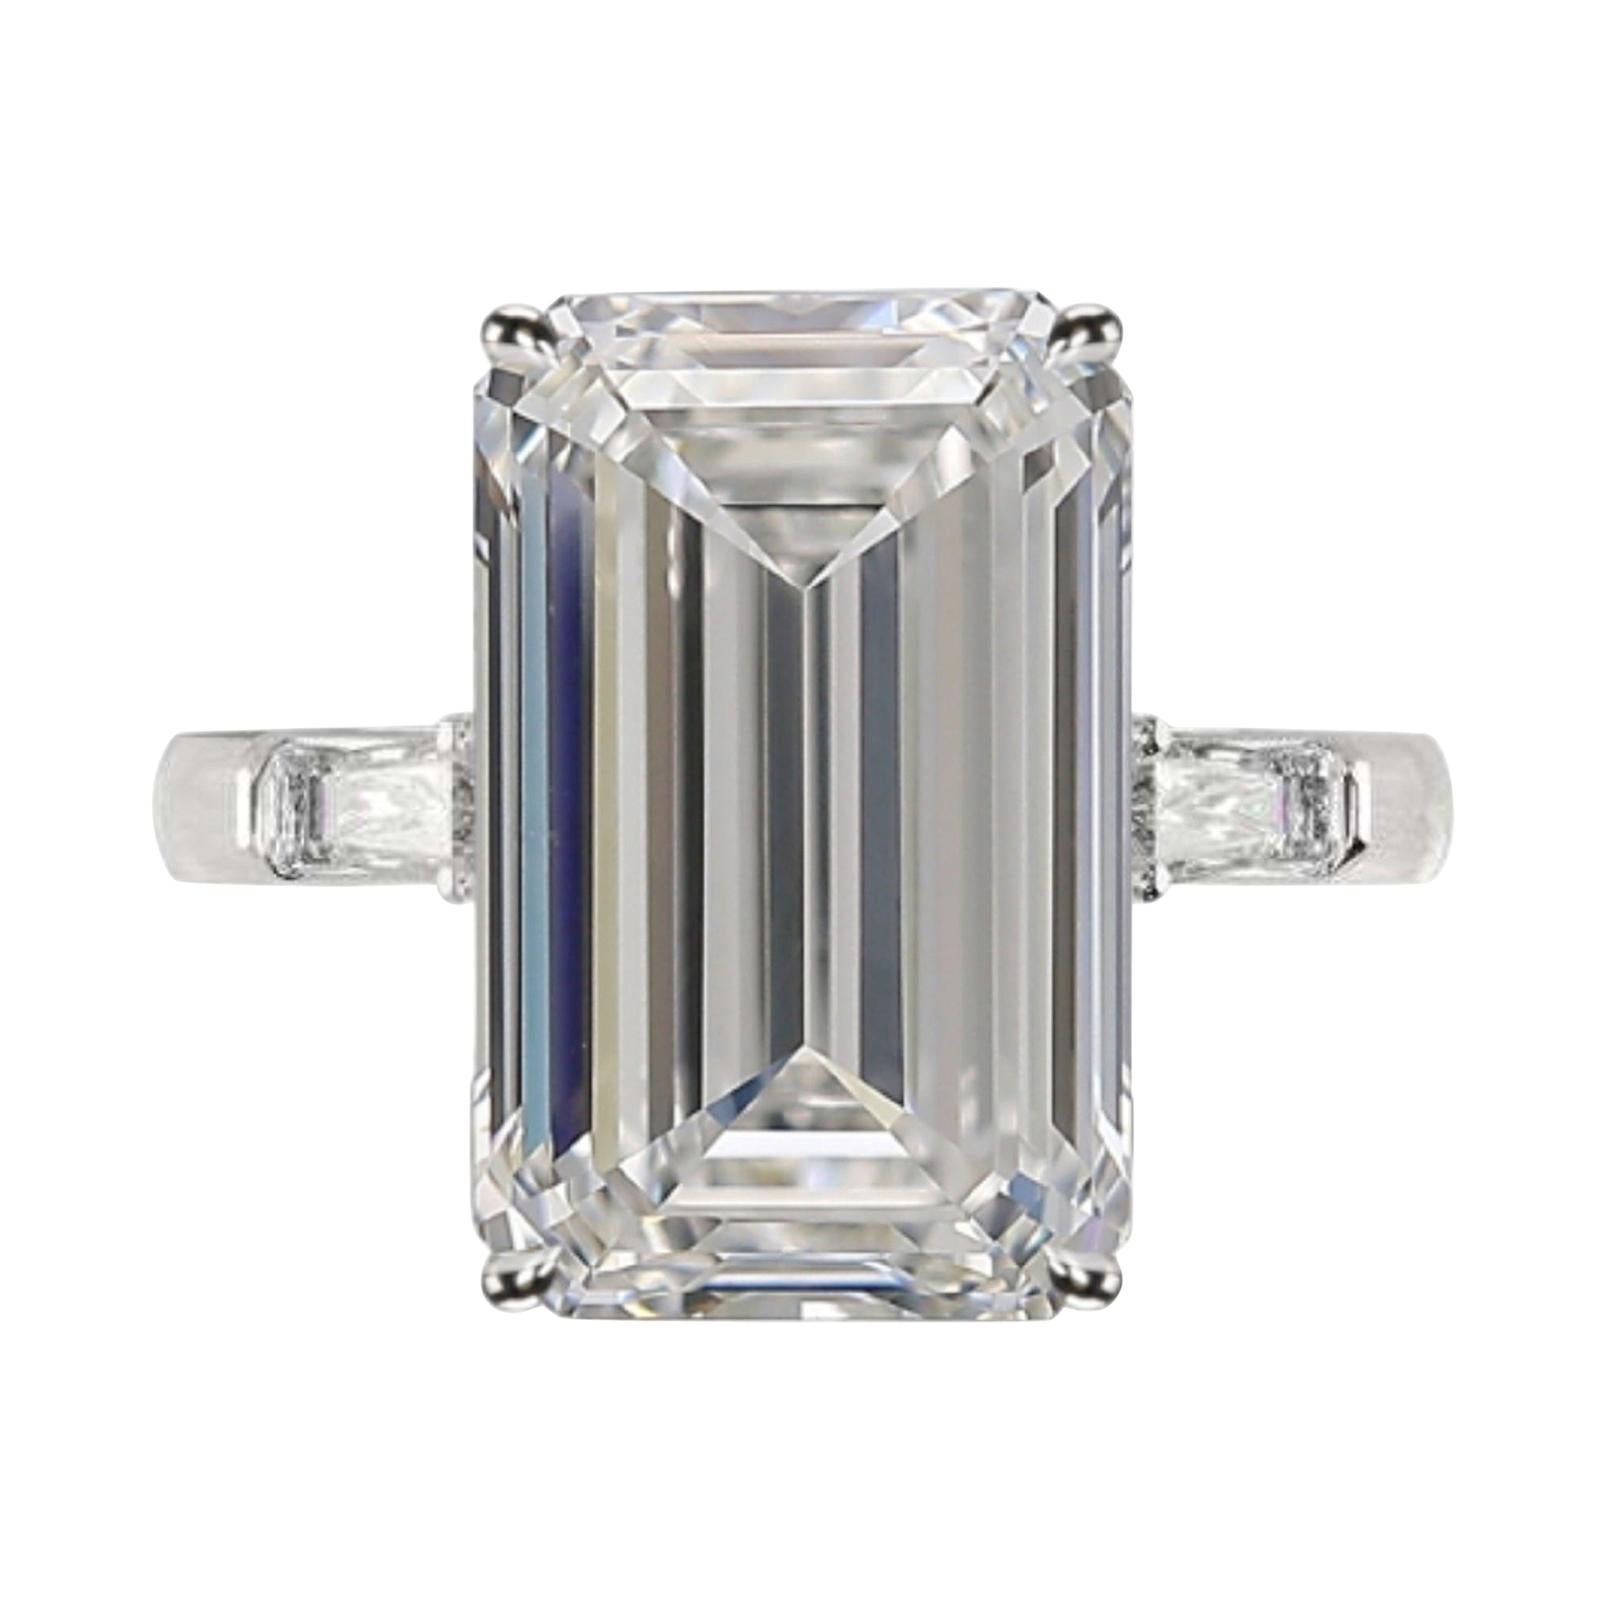 GIA Certified 5.65 Carat Emerald Cut Diamond Ring Very Long Ratio D Color VS2